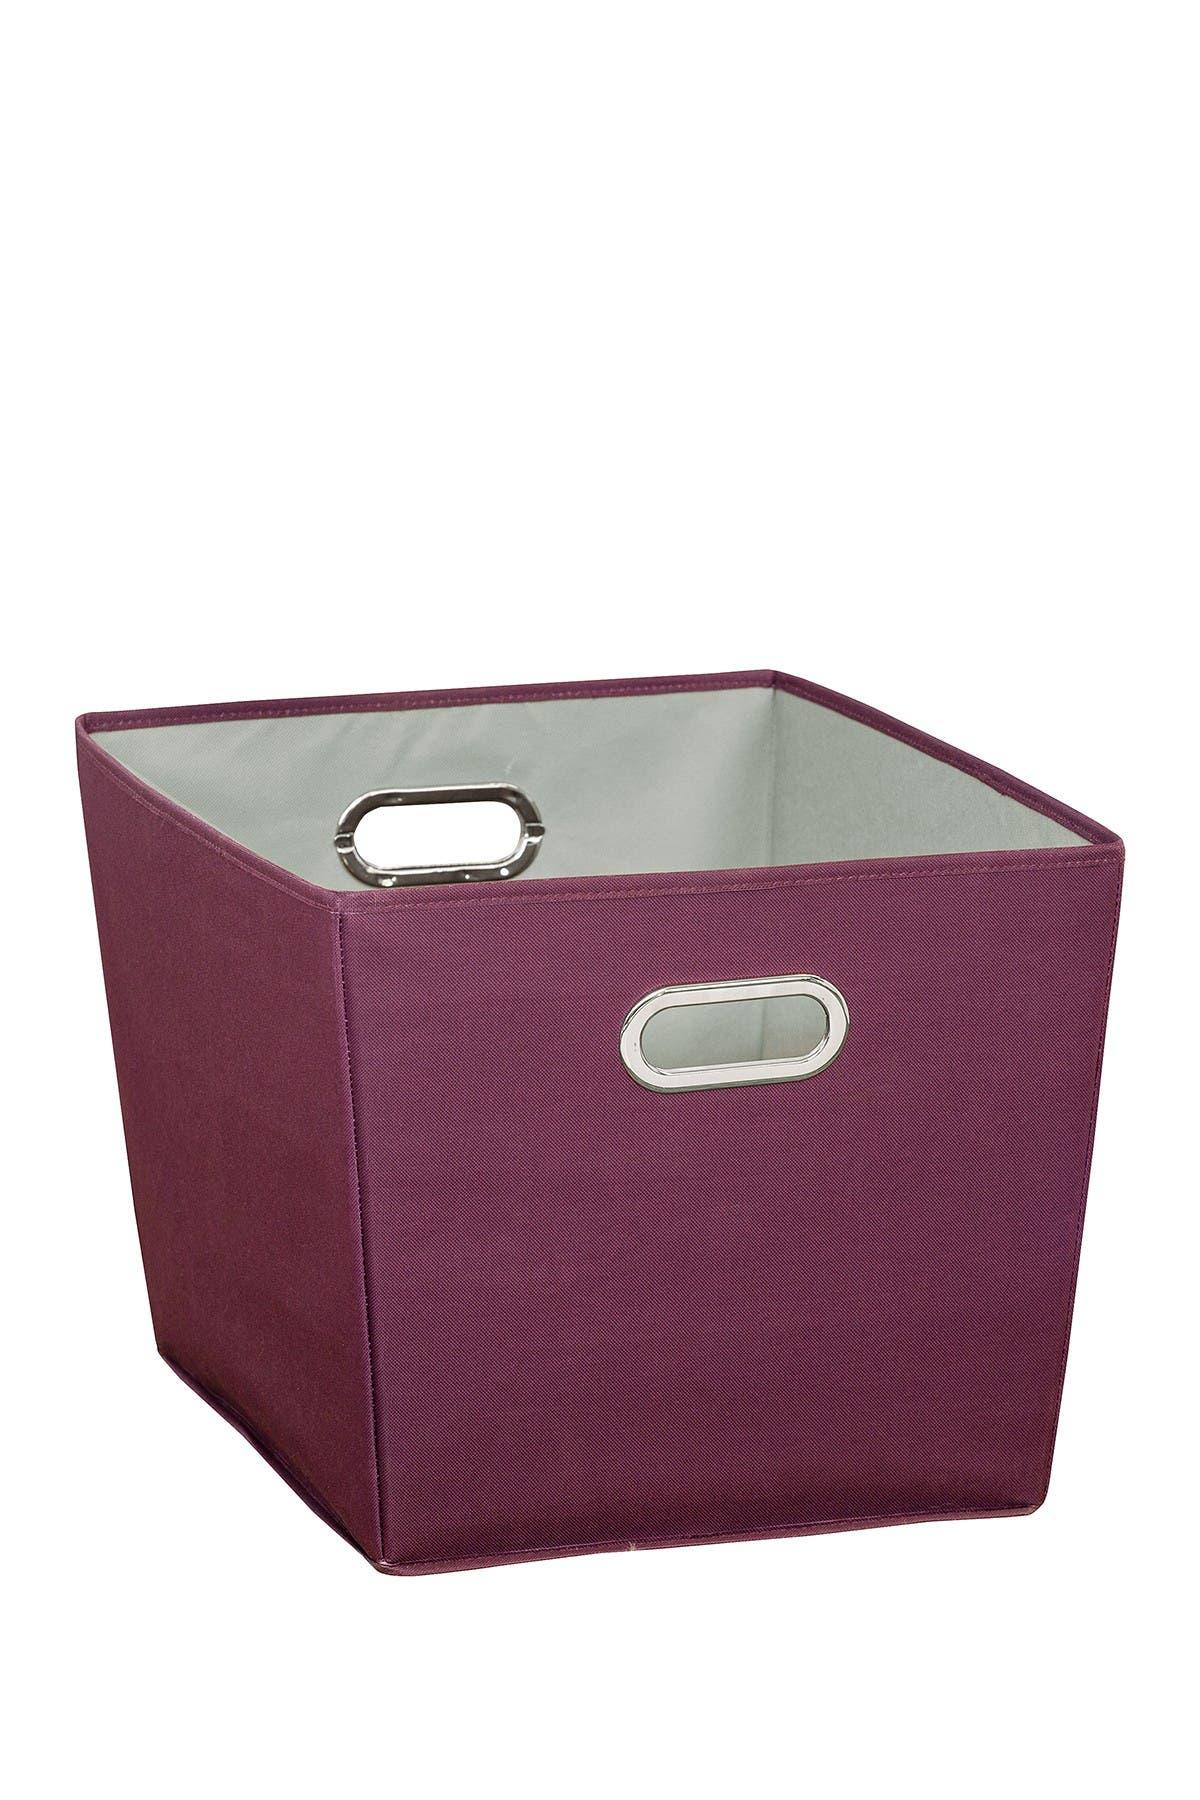 Image of Honey-Can-Do Purple Large Storage Bin